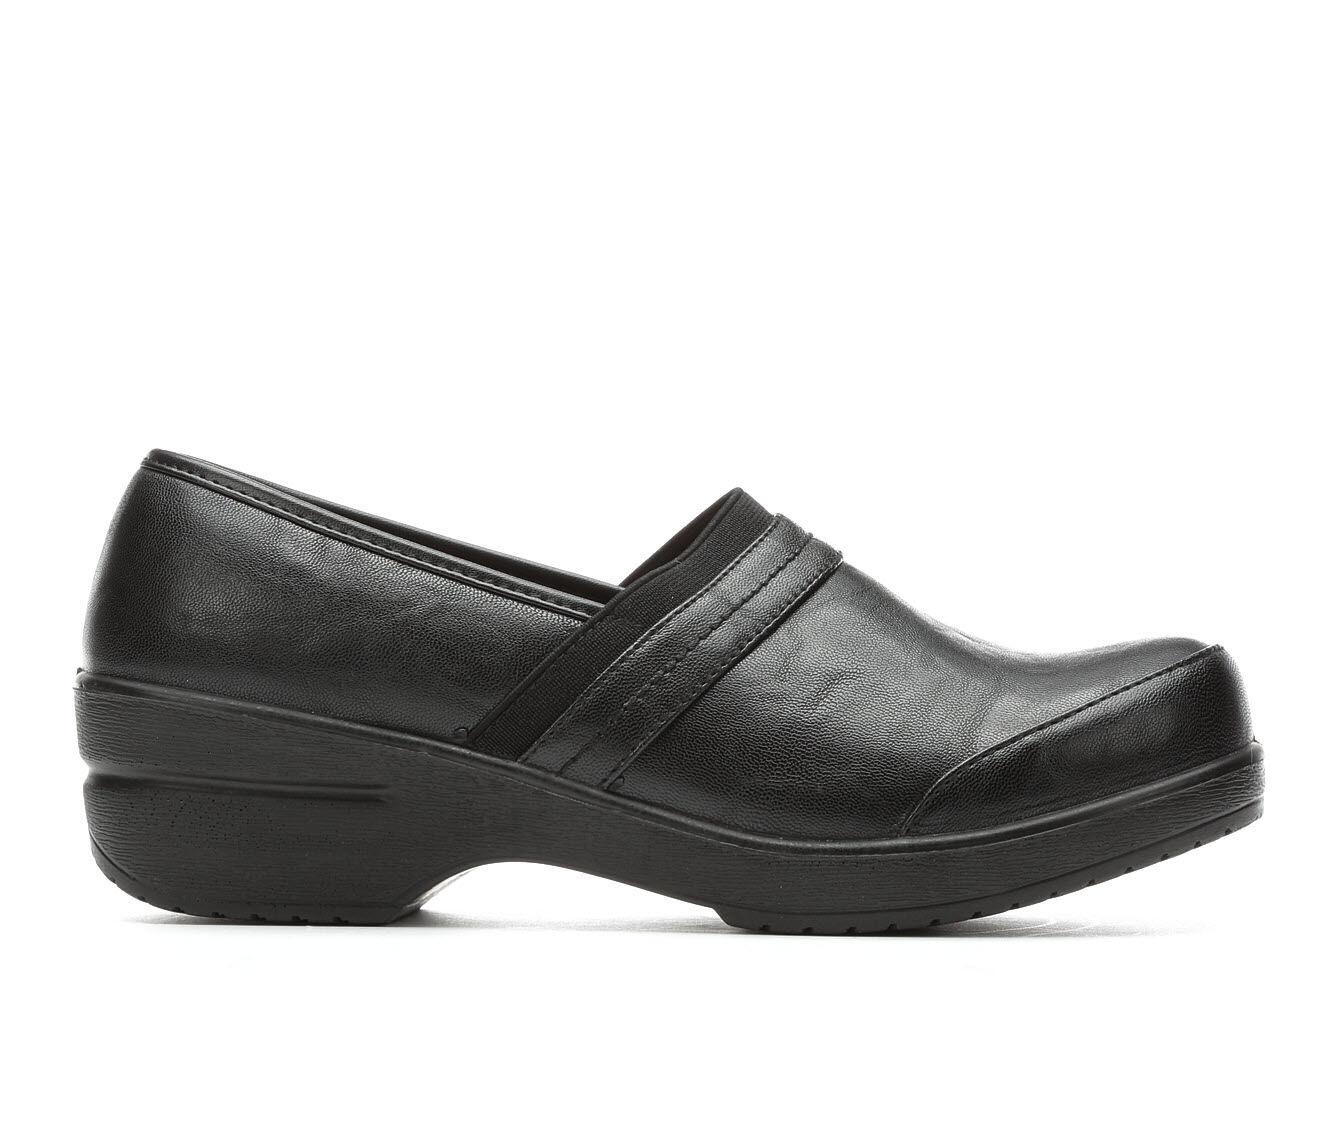 discount original footaction online Women's Easy Street Origin Clogs great deals discount real B8GPp5vuTc